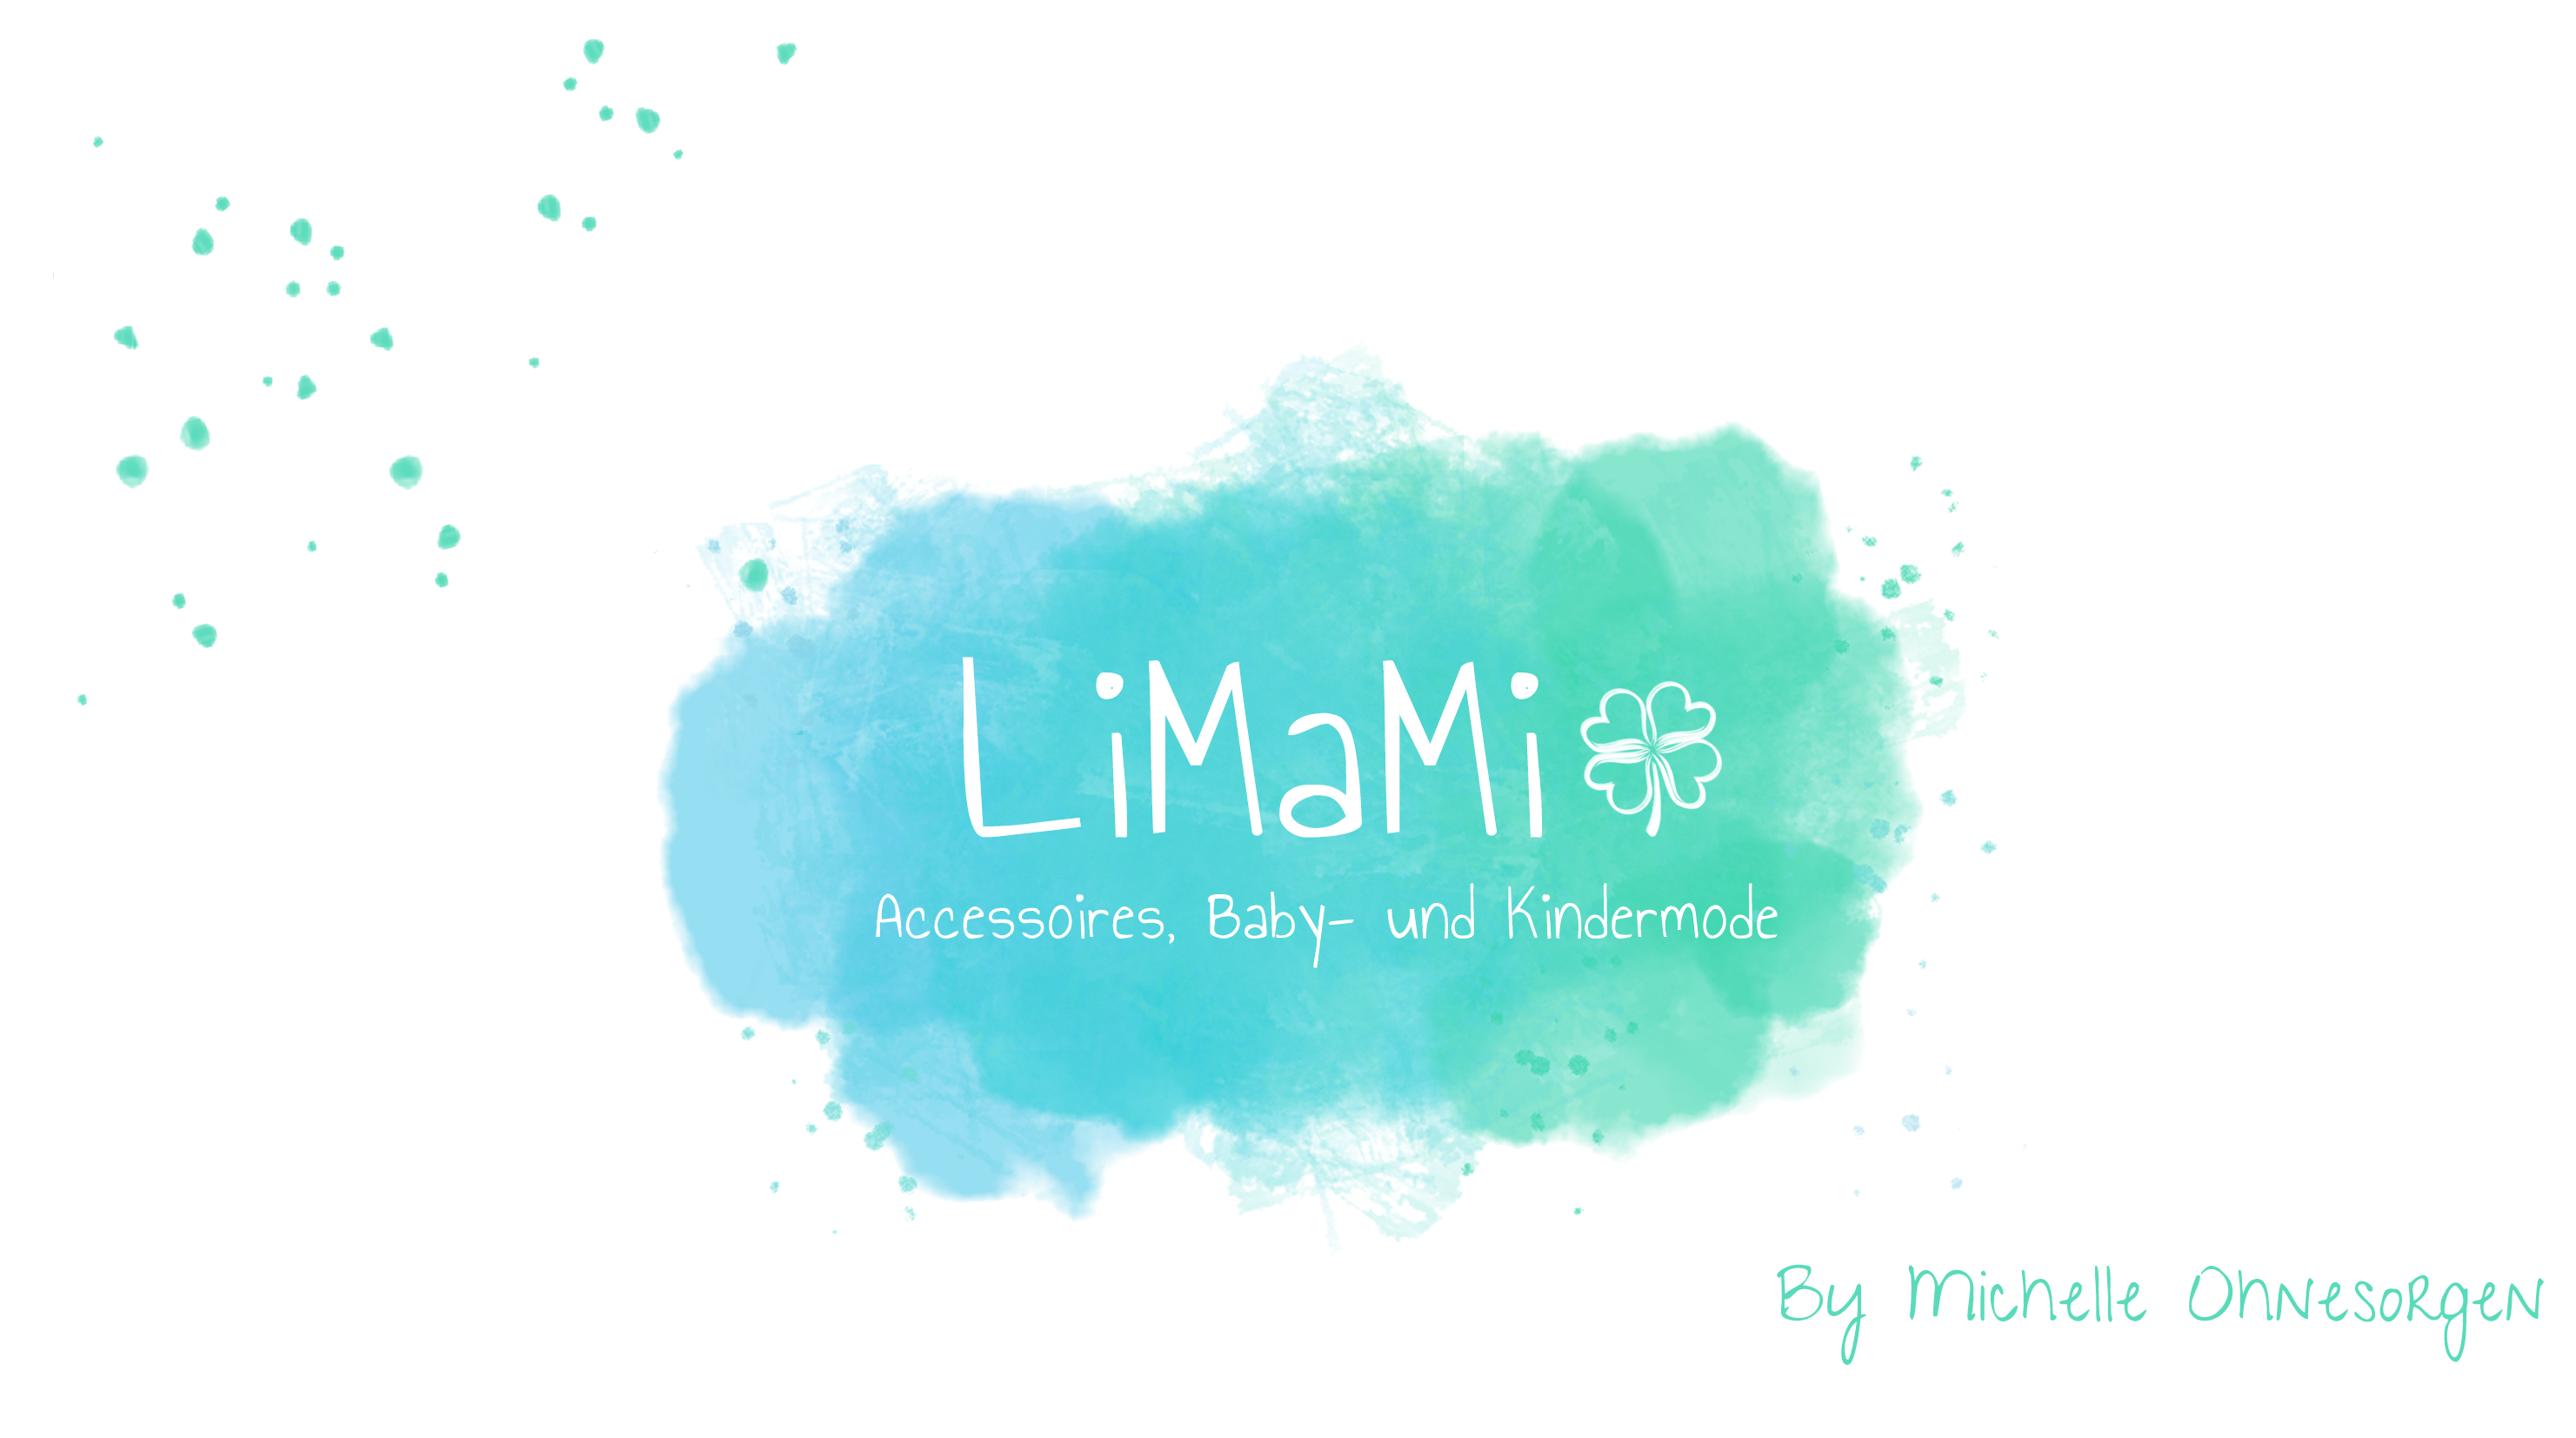 Limami Kindermode - Accessoires, Baby- und Kindermode